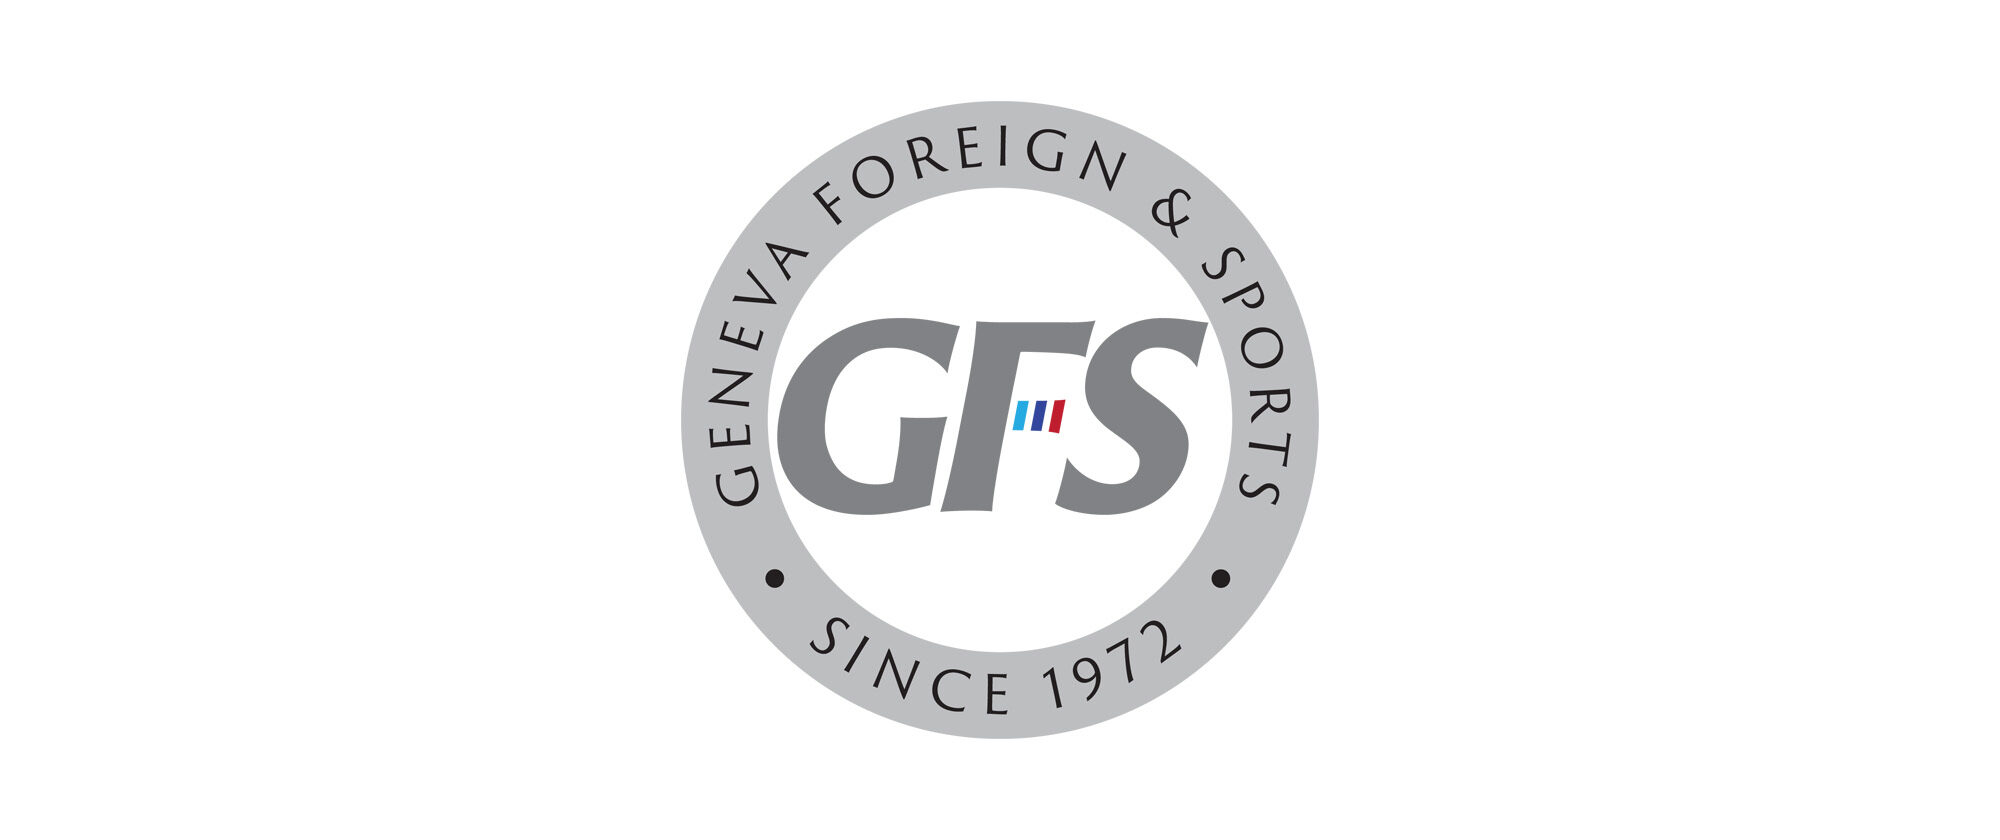 Geneva Foreign And Sports Circle Logo Identity